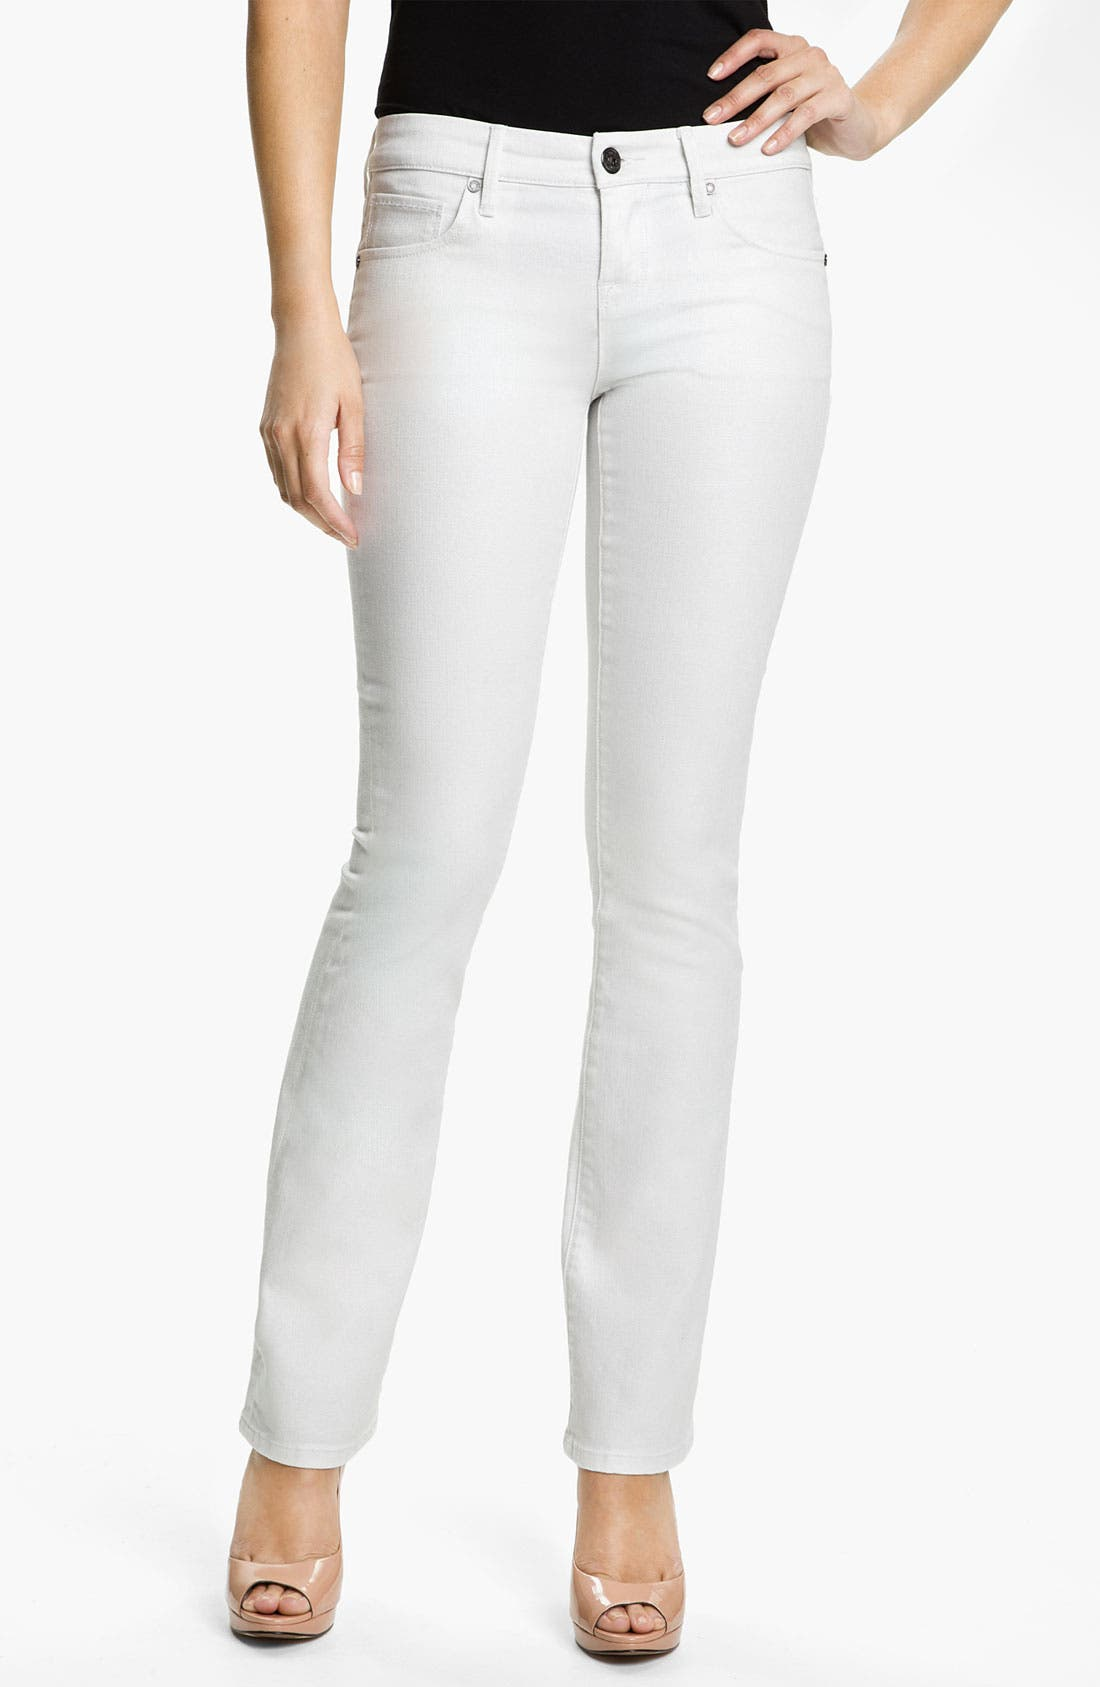 Main Image - Isaac Mizrahi Jeans 'Skylar' Slim Bootcut Jeans